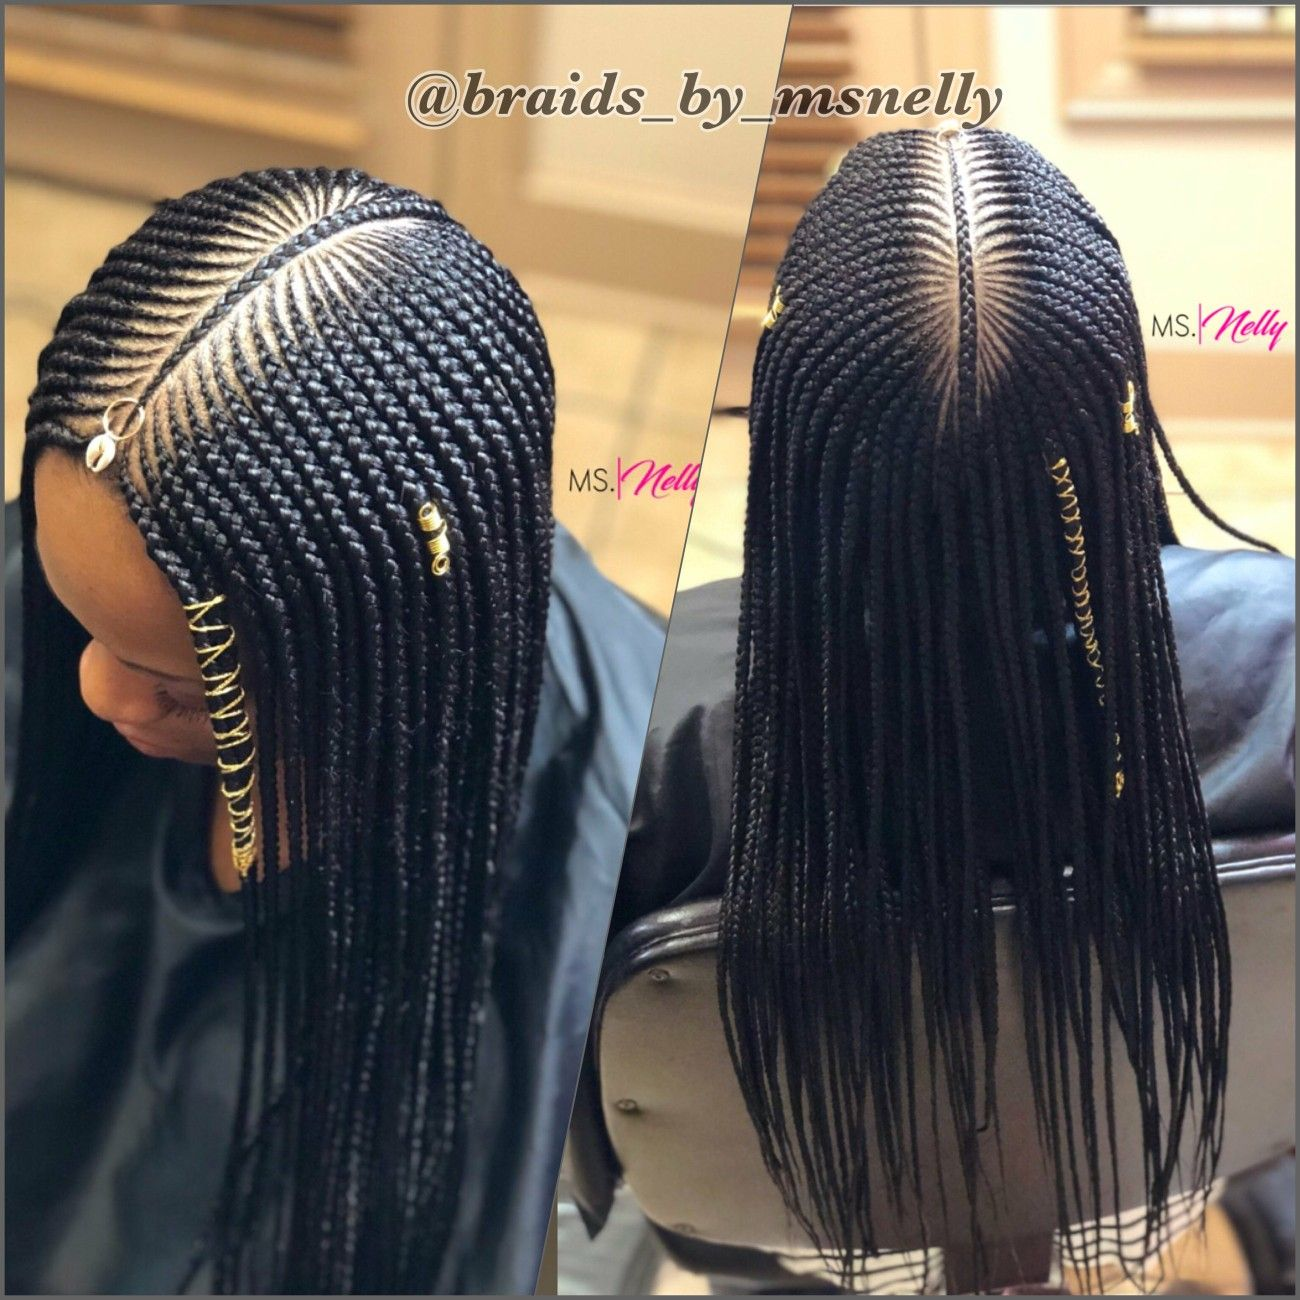 Tribal braids lemonade braids side braids formation braids small